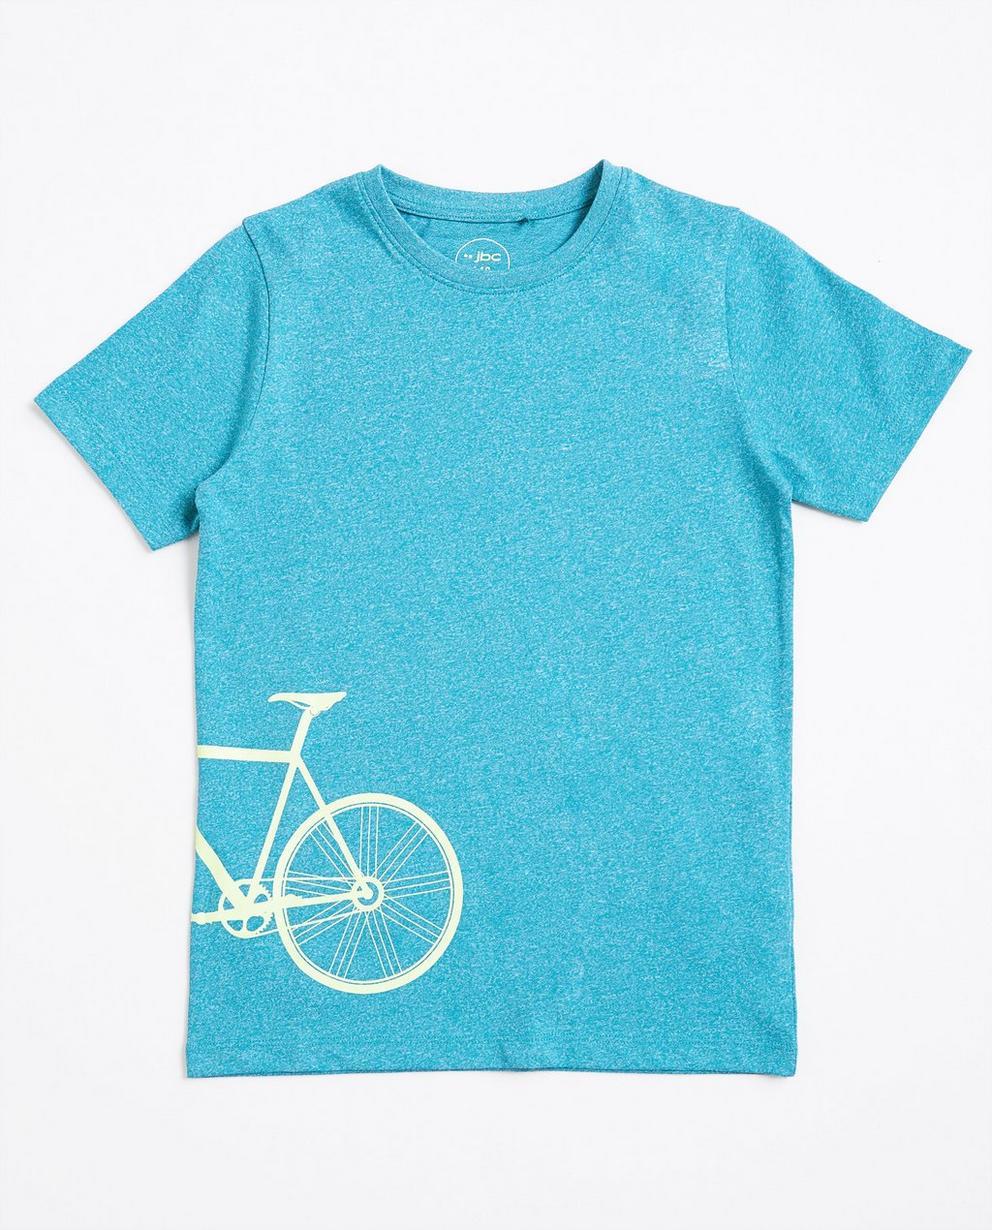 Grijs gespikkeld T-shirt met print FR - null - JBC